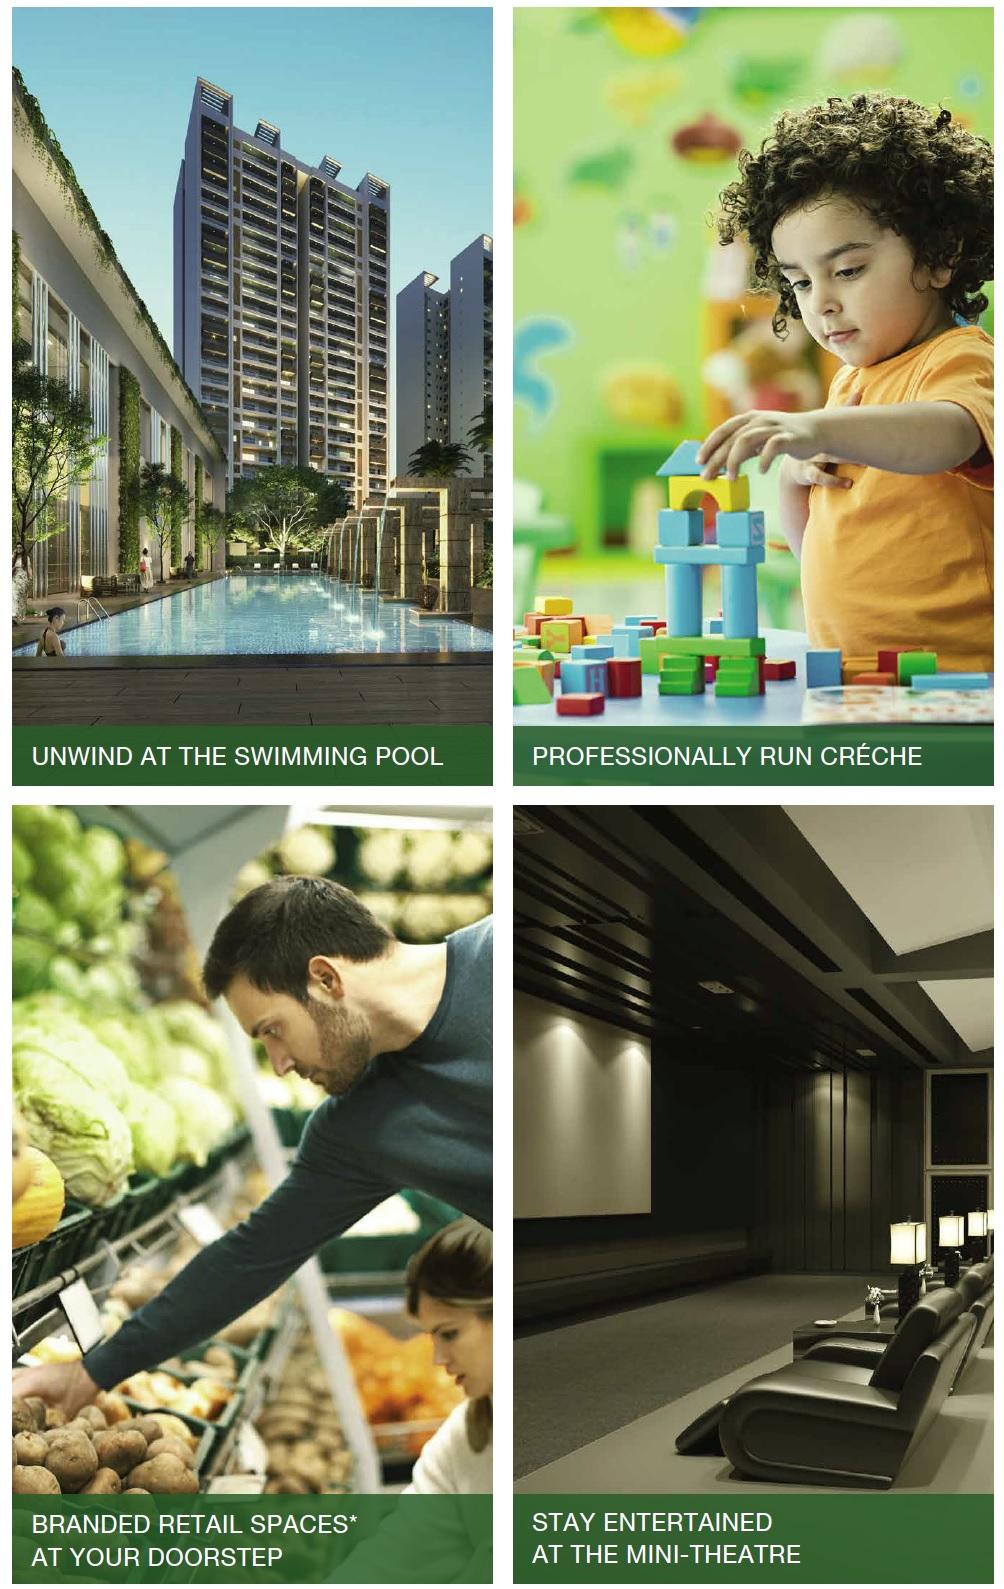 godrej air sector 85 amenities features2